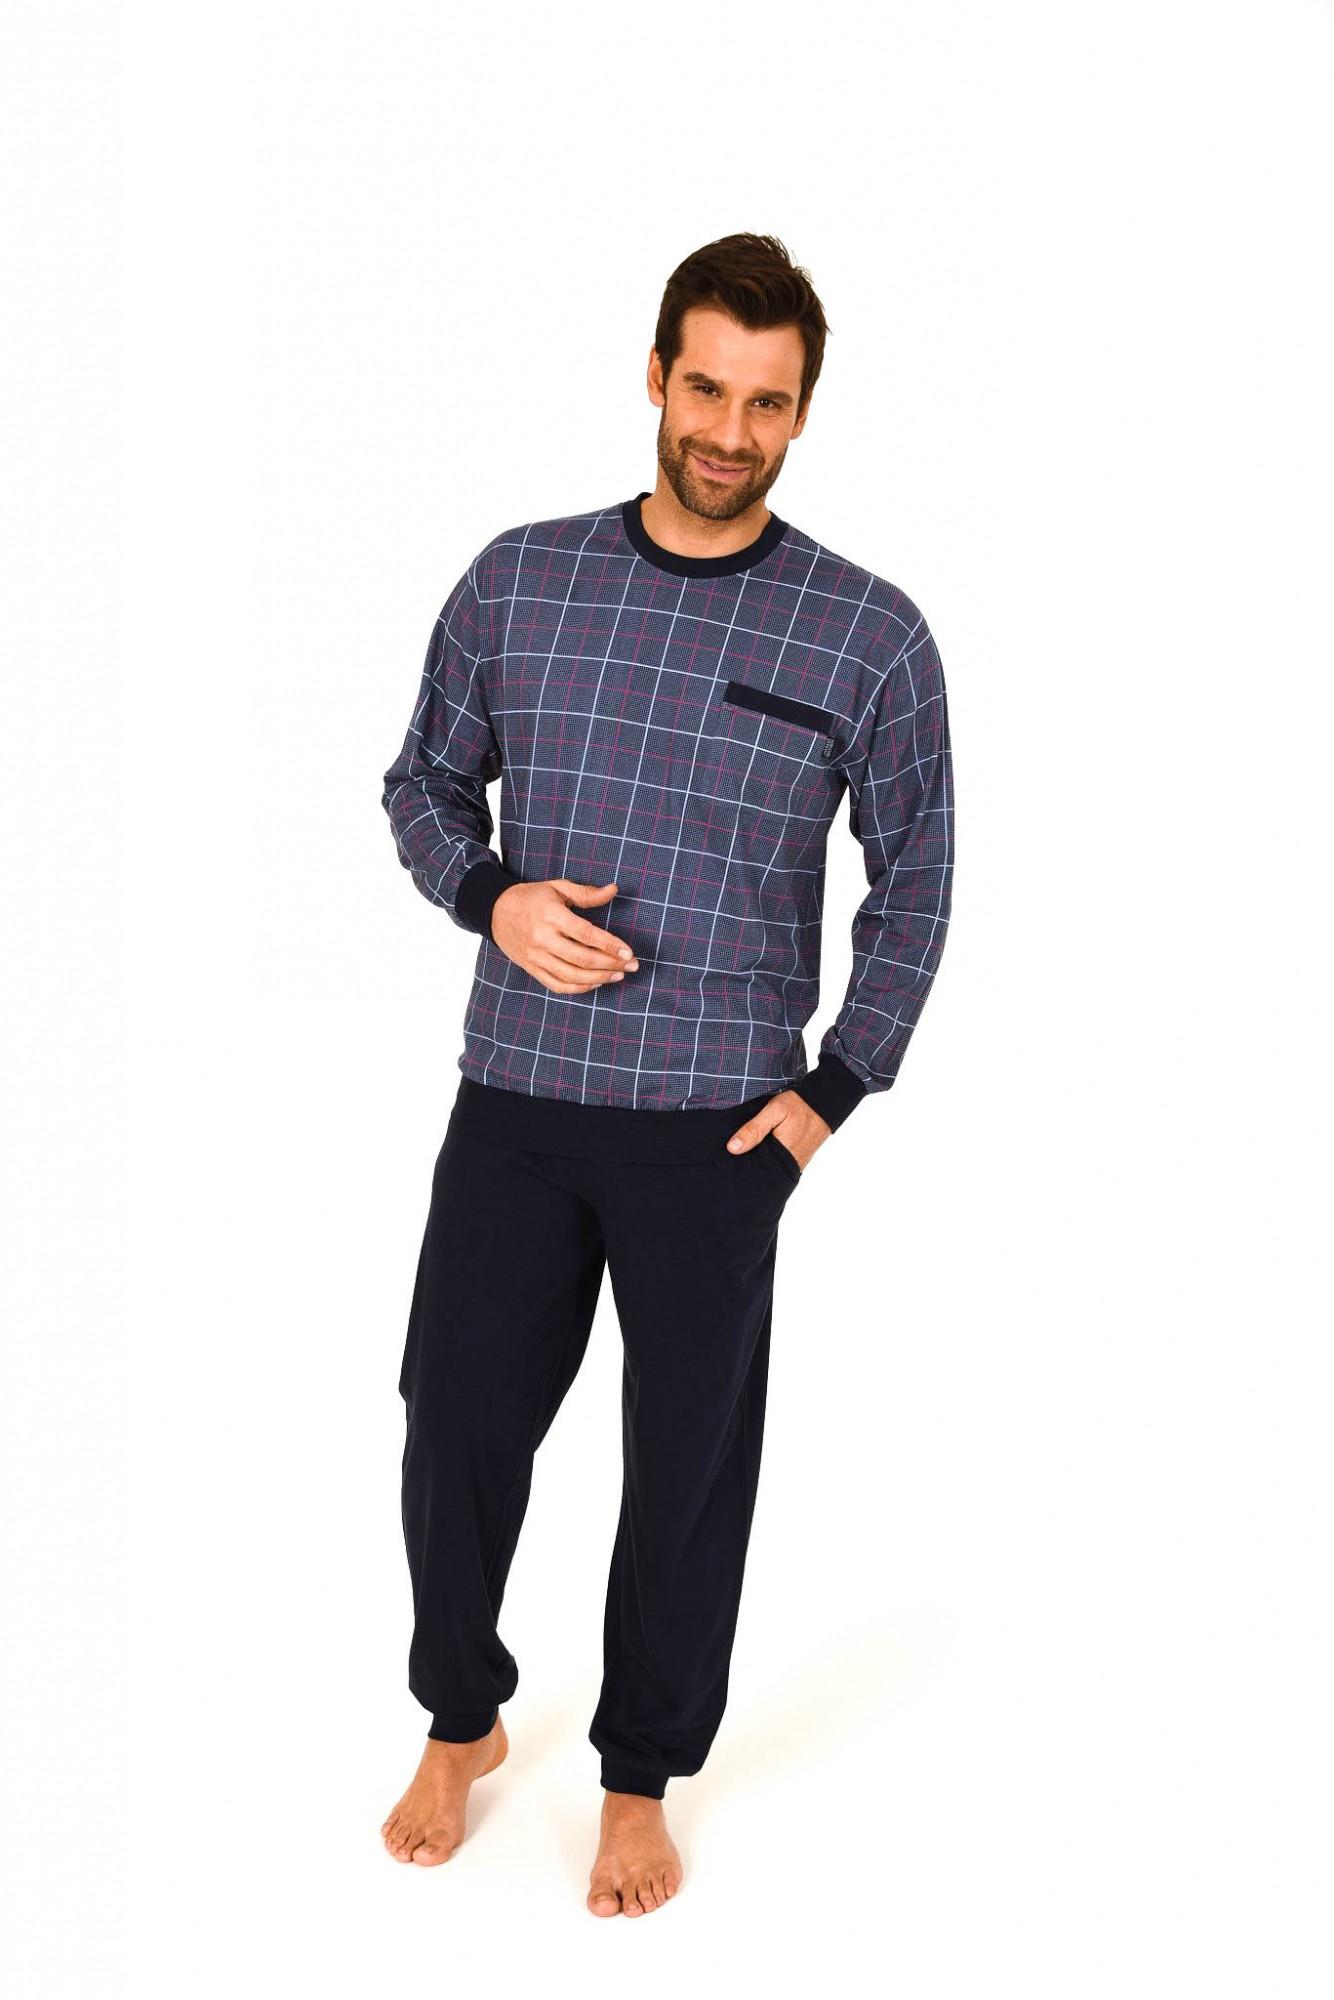 Herren Pyjama lang mit Bündchen – Karooptik – 261 101 90 482